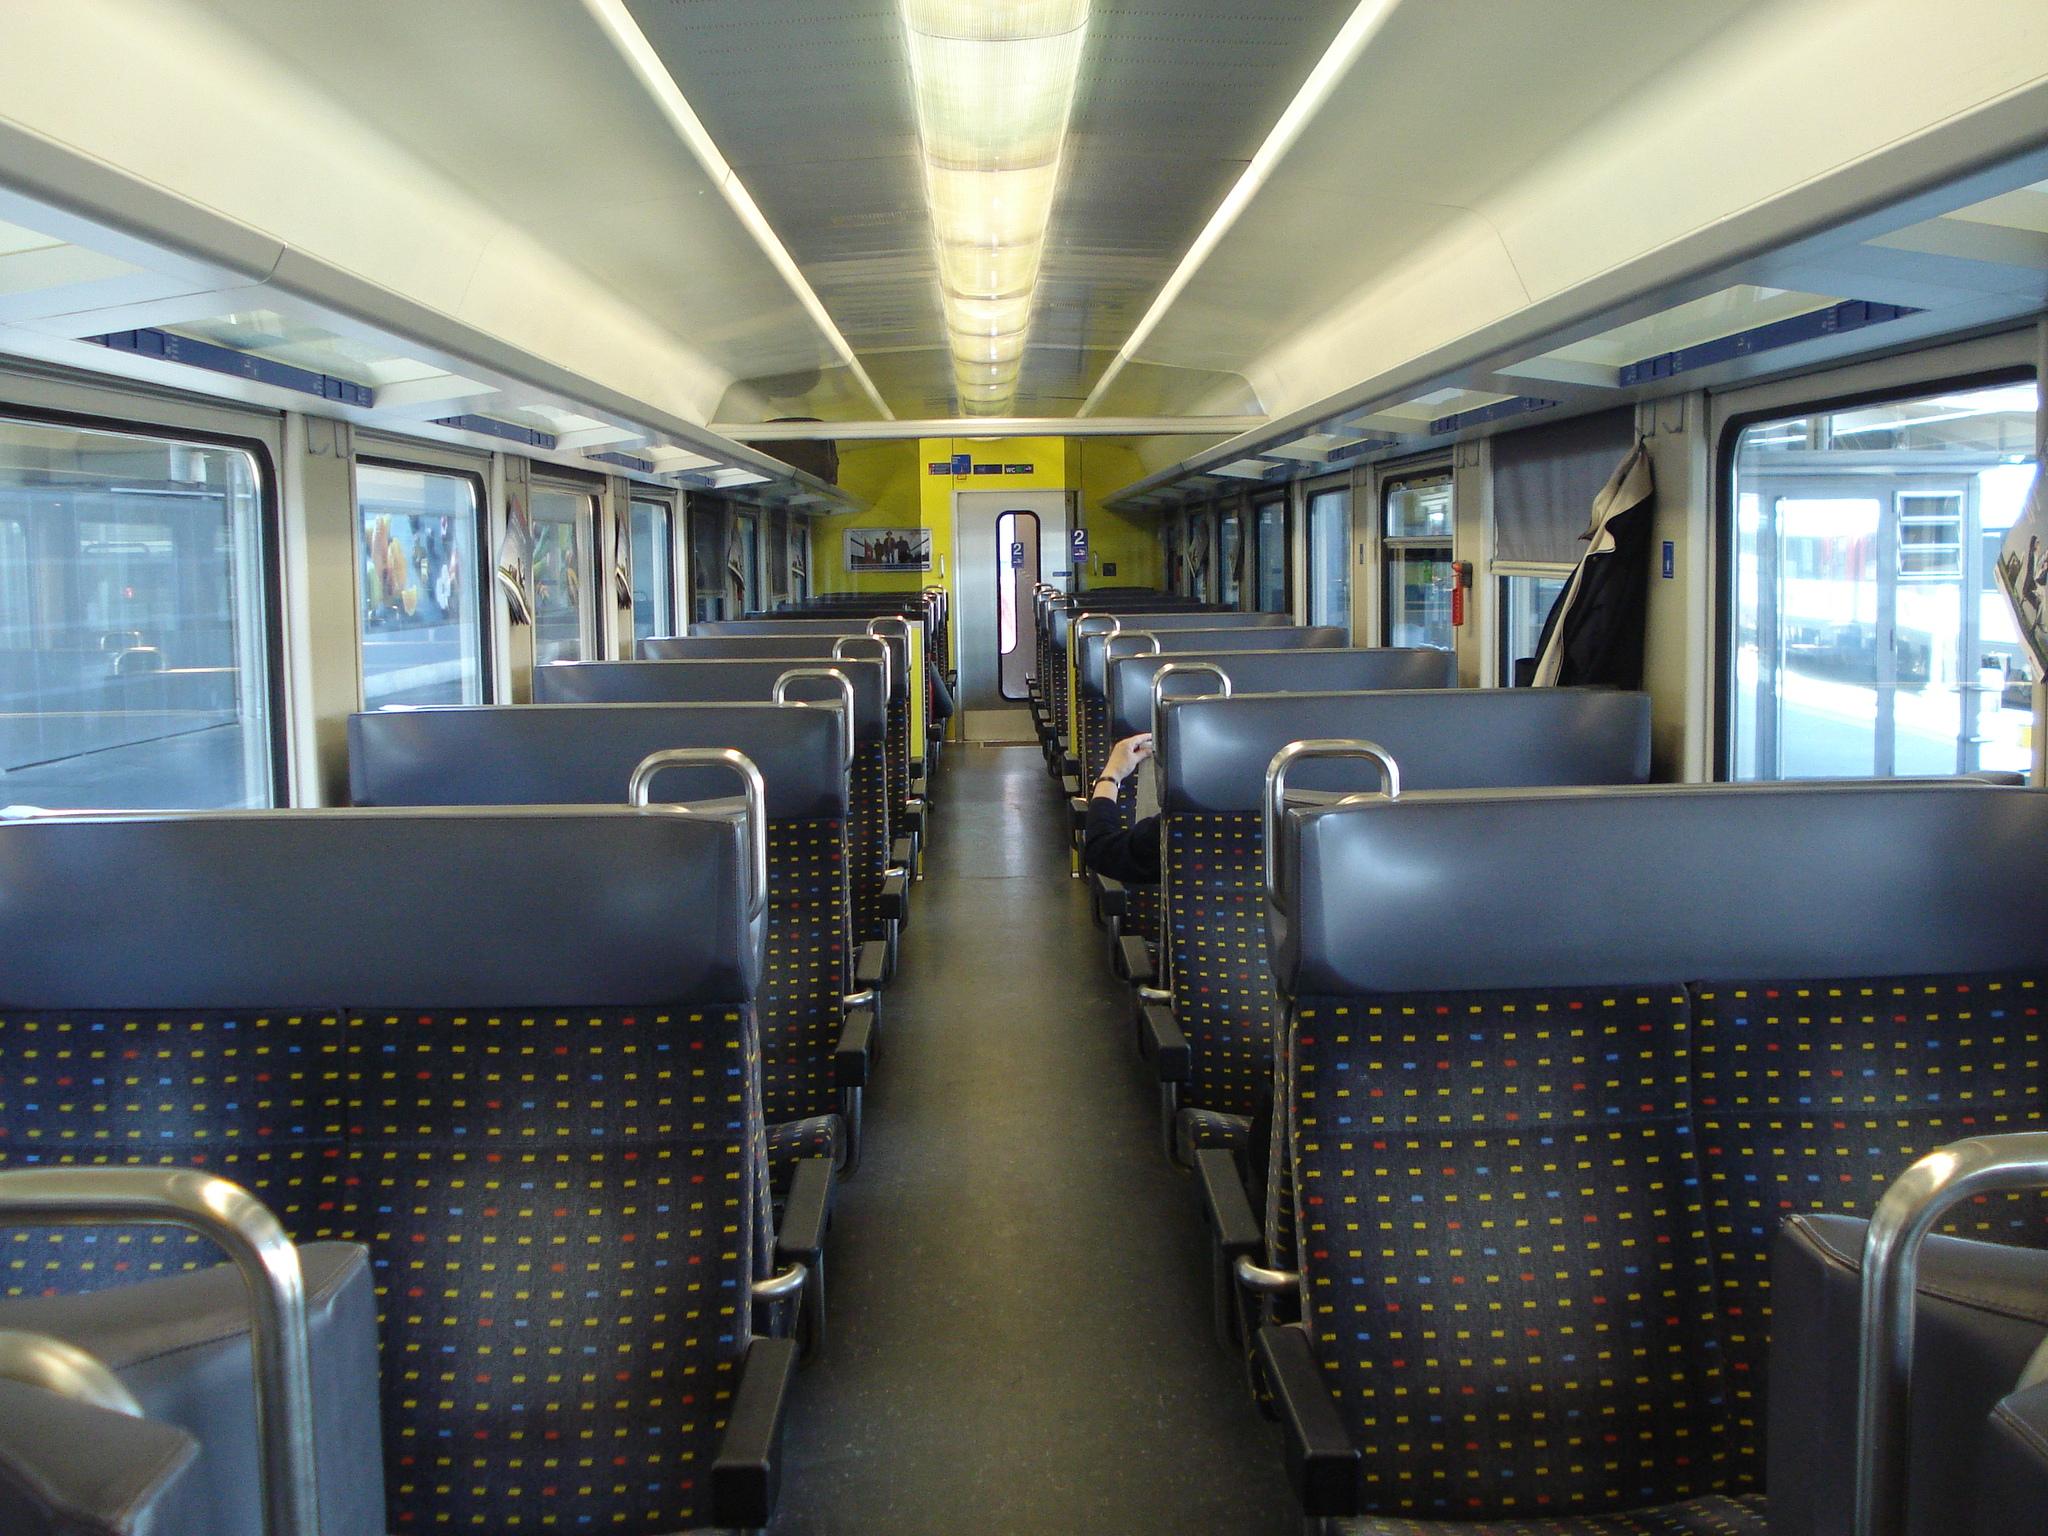 Interior of Swiss regional train